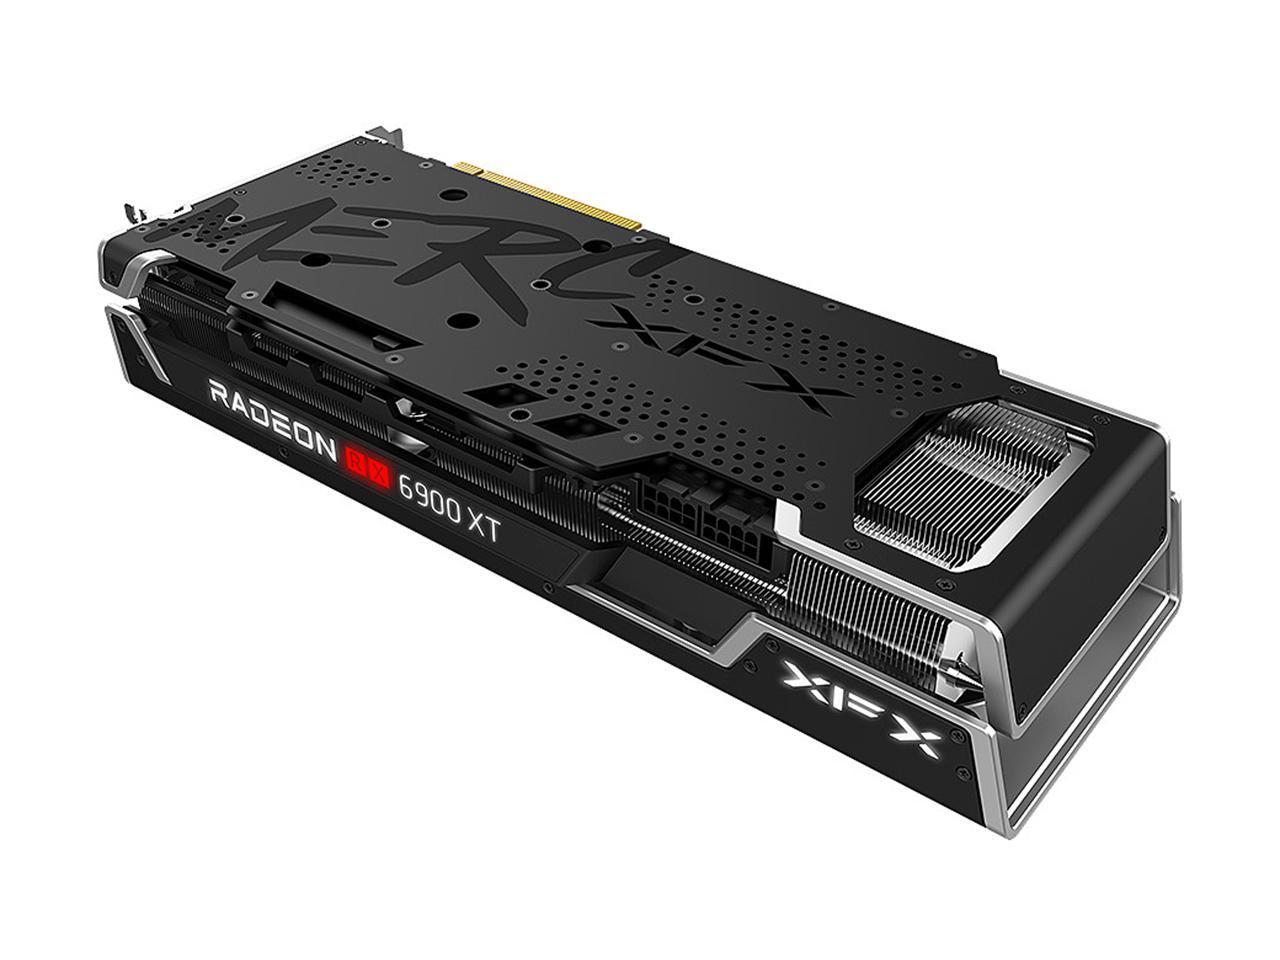 xfx-radeon-rx-6900-xt-speedster-merci-319-graphics-card-_3